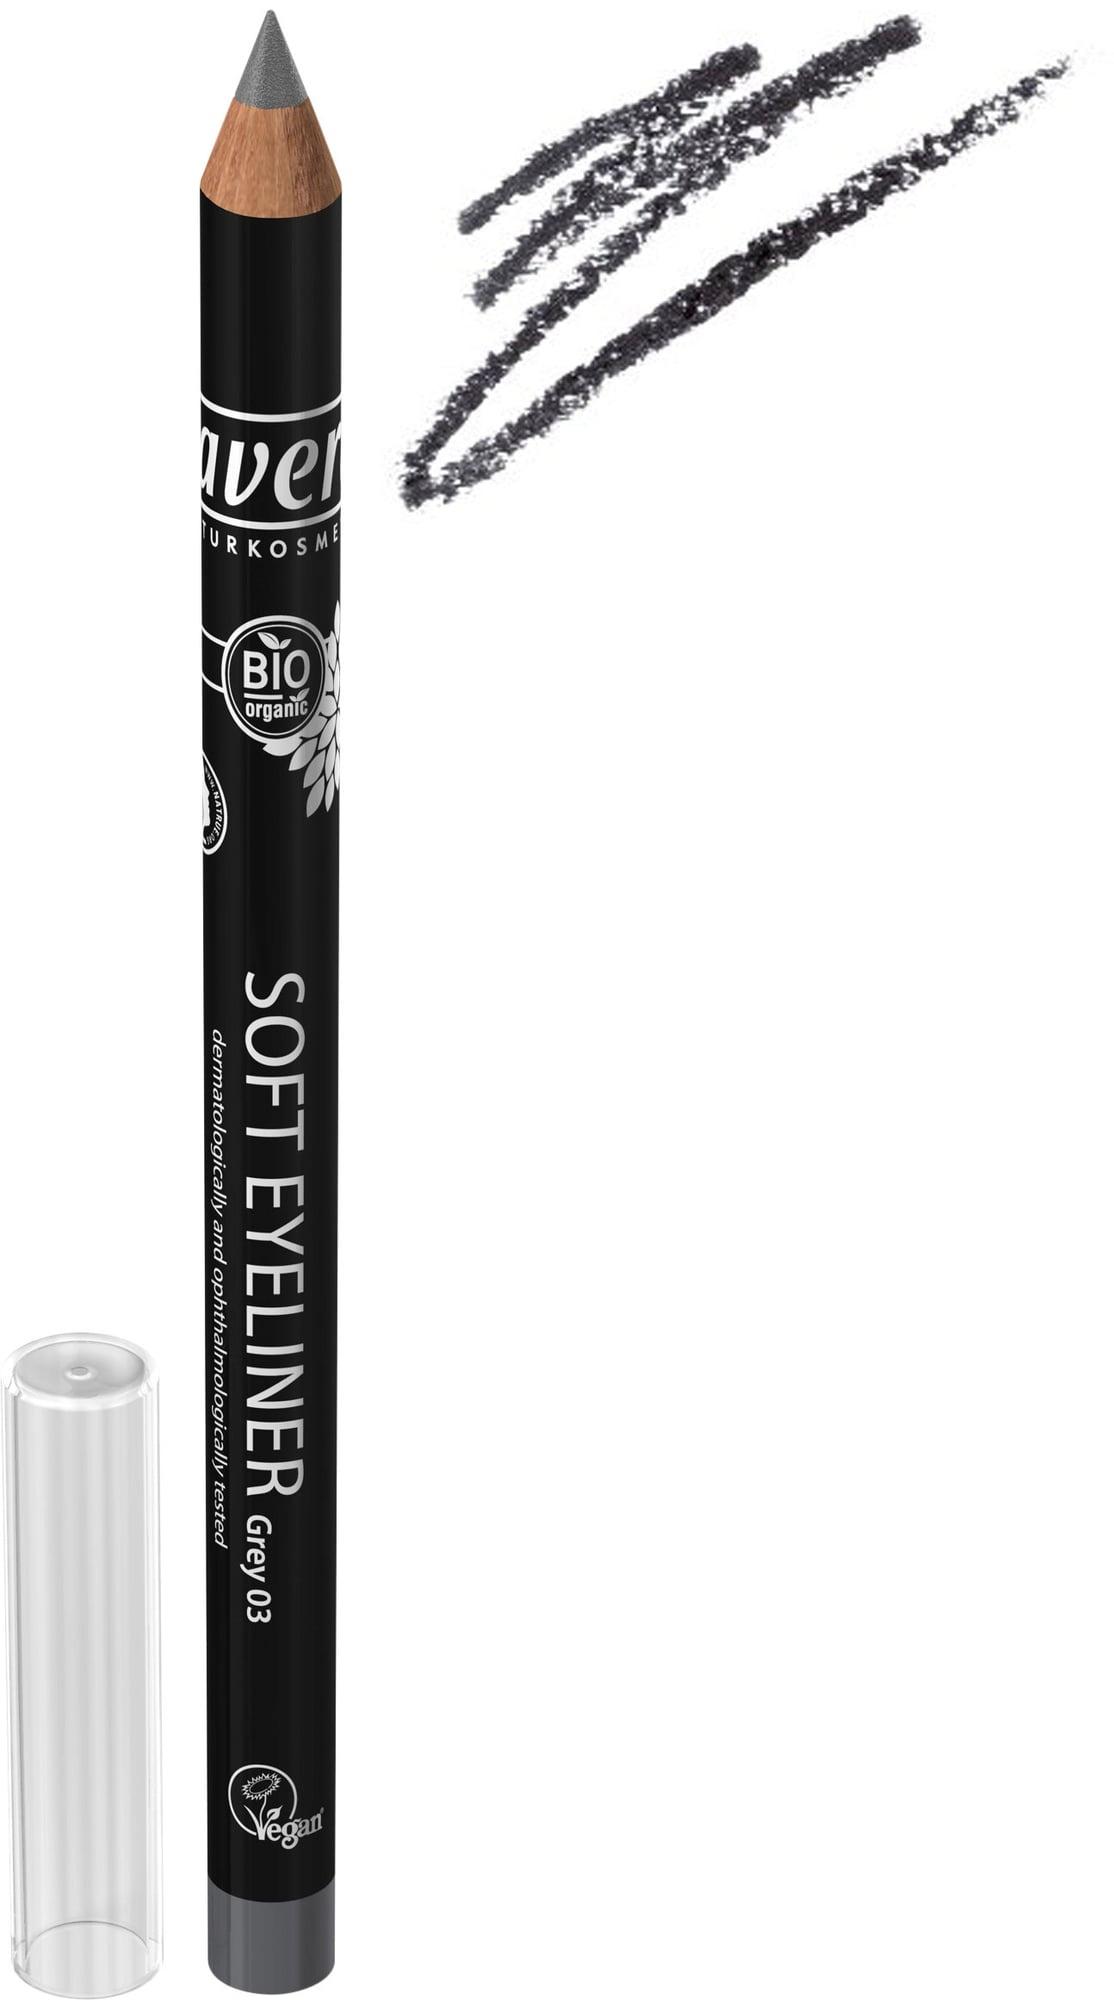 Lavera Trend Soft Eyeliner Pencil 1.4g Grey 03